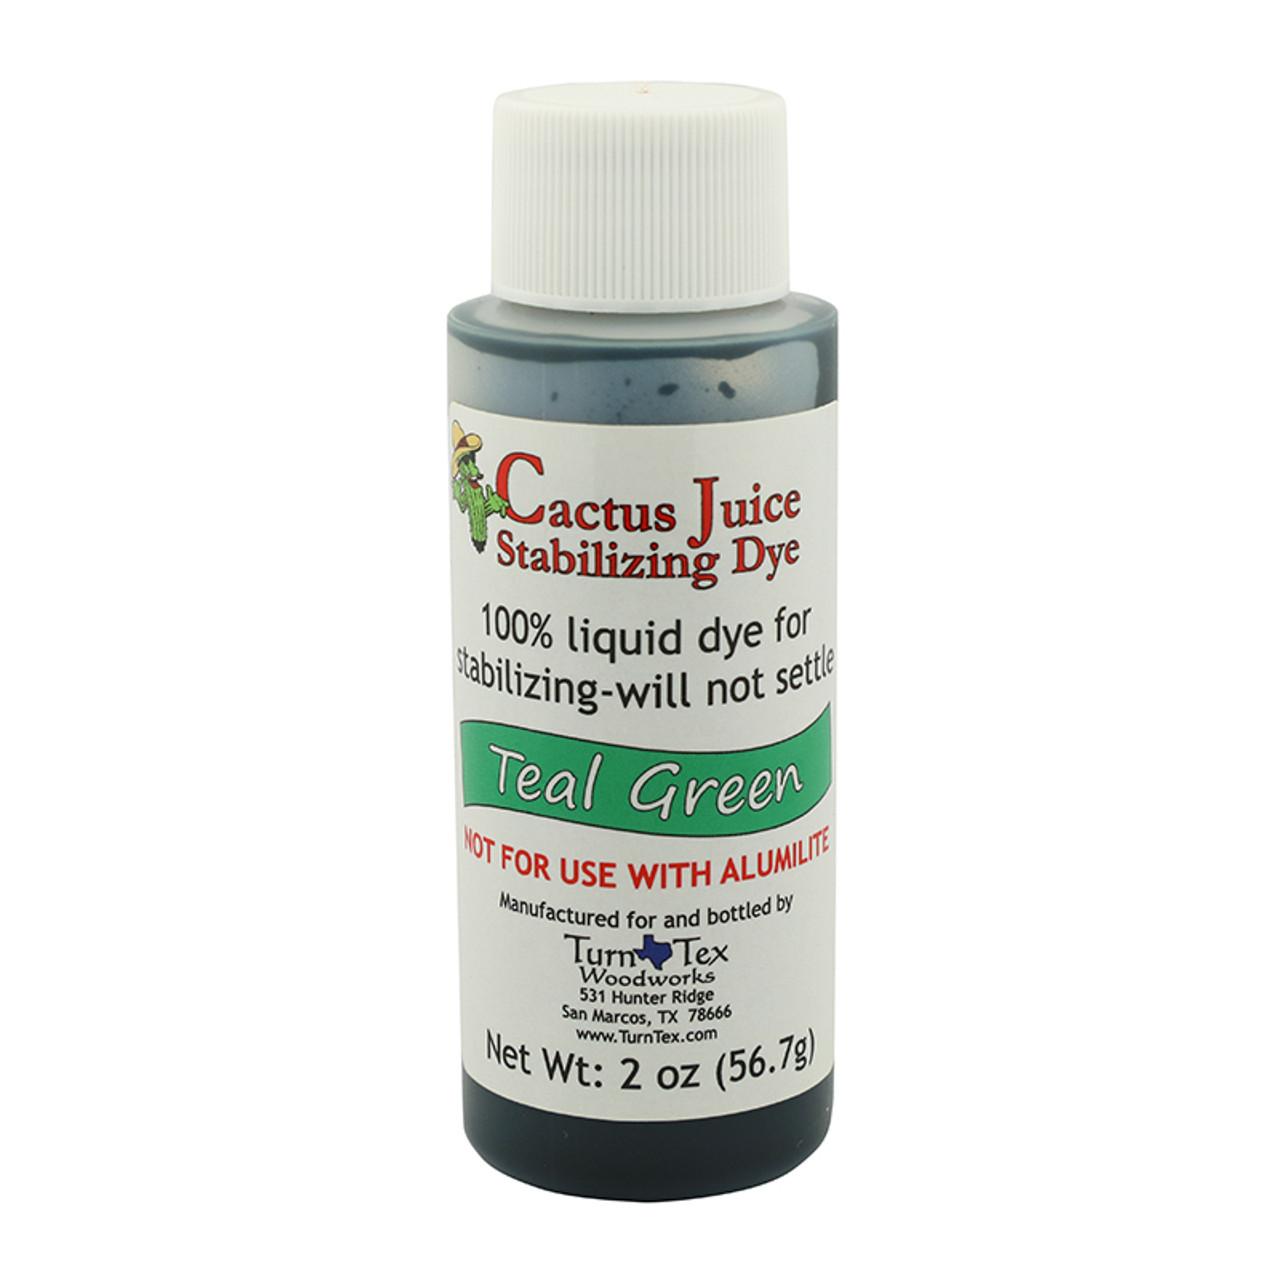 Cactus Juice Stabilizing Wood Coloring Dye - 2 oz